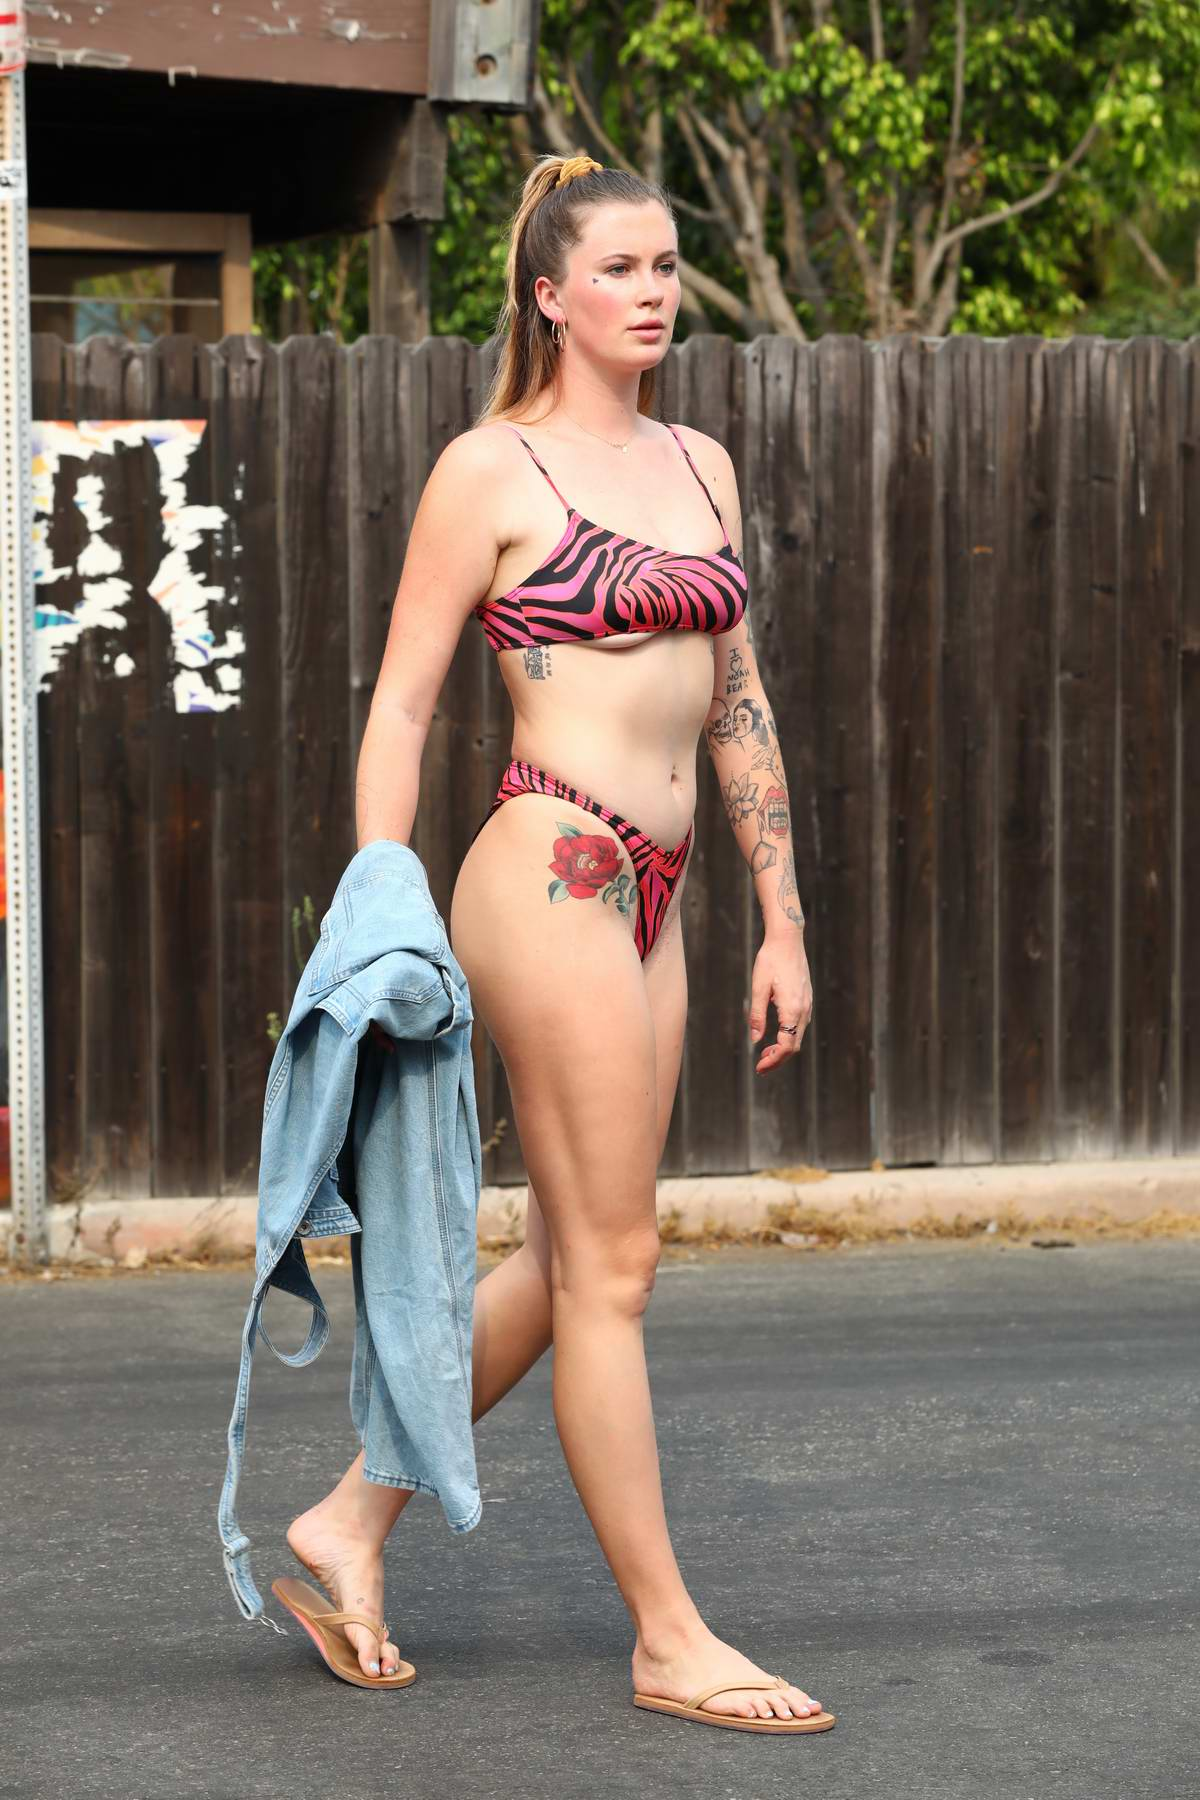 Ireland Baldwin seen wearing PrettyLittleThing's Hot Pink Zebra Print bikini in Malibu, California